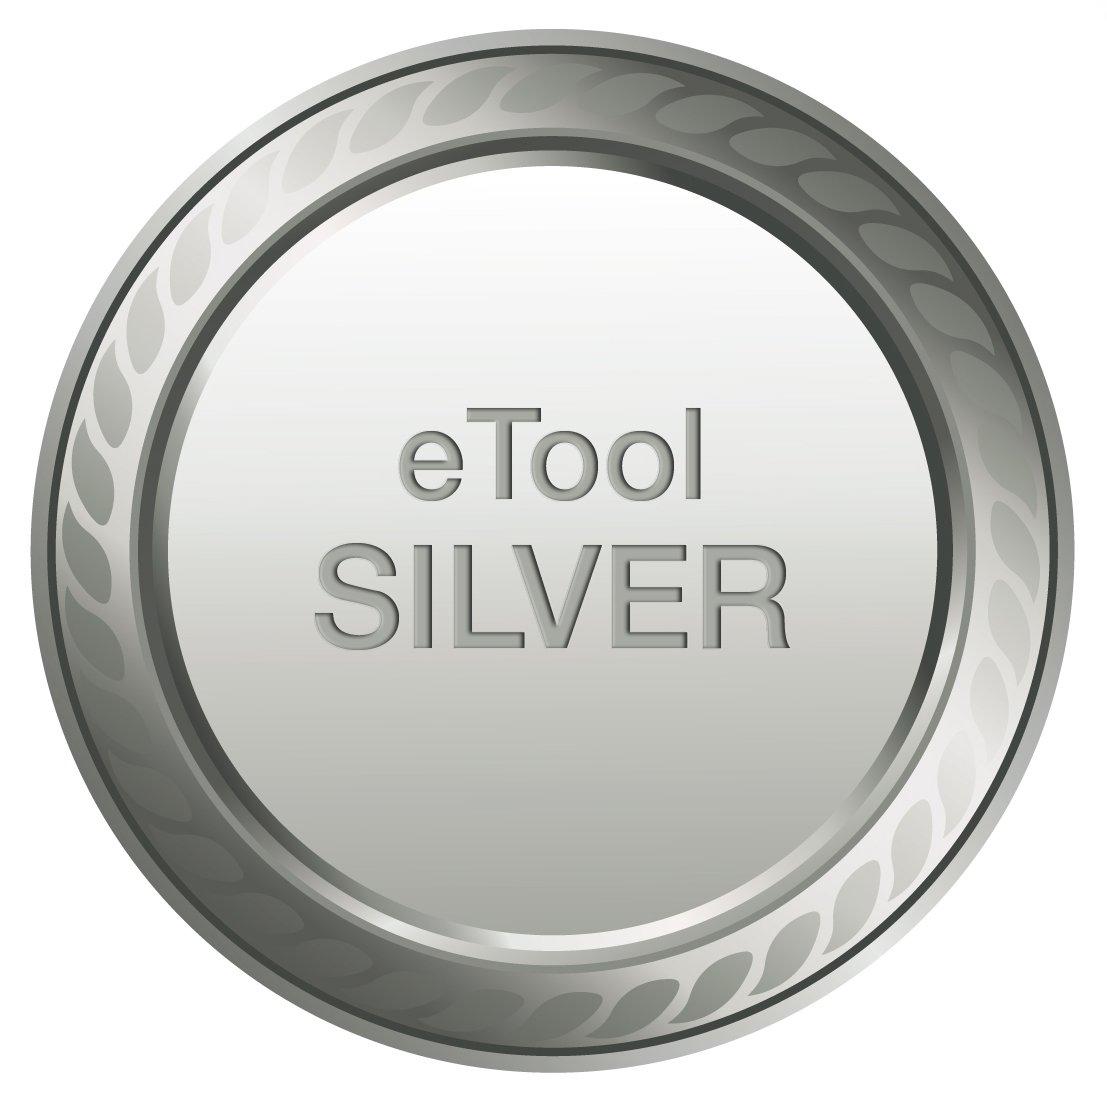 etool_silver_medal